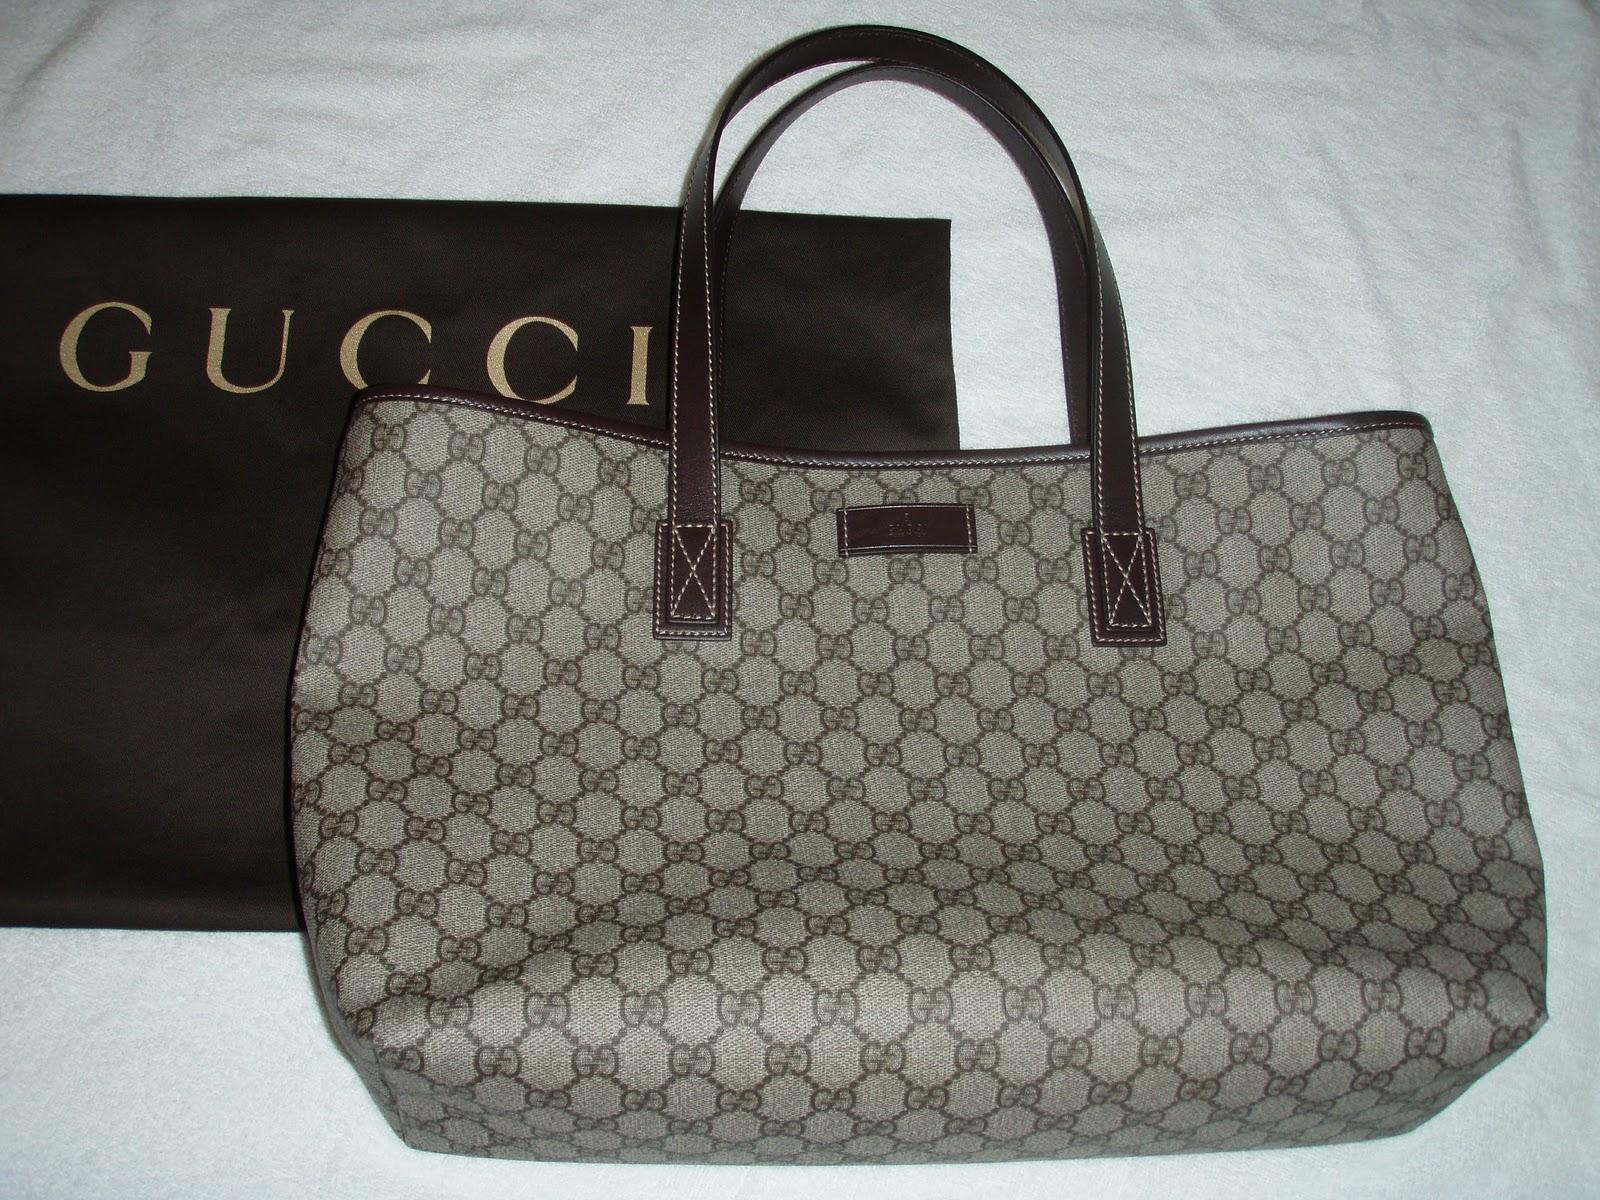 gucci 211137 492174 medium tote coach bag on sale. Black Bedroom Furniture Sets. Home Design Ideas